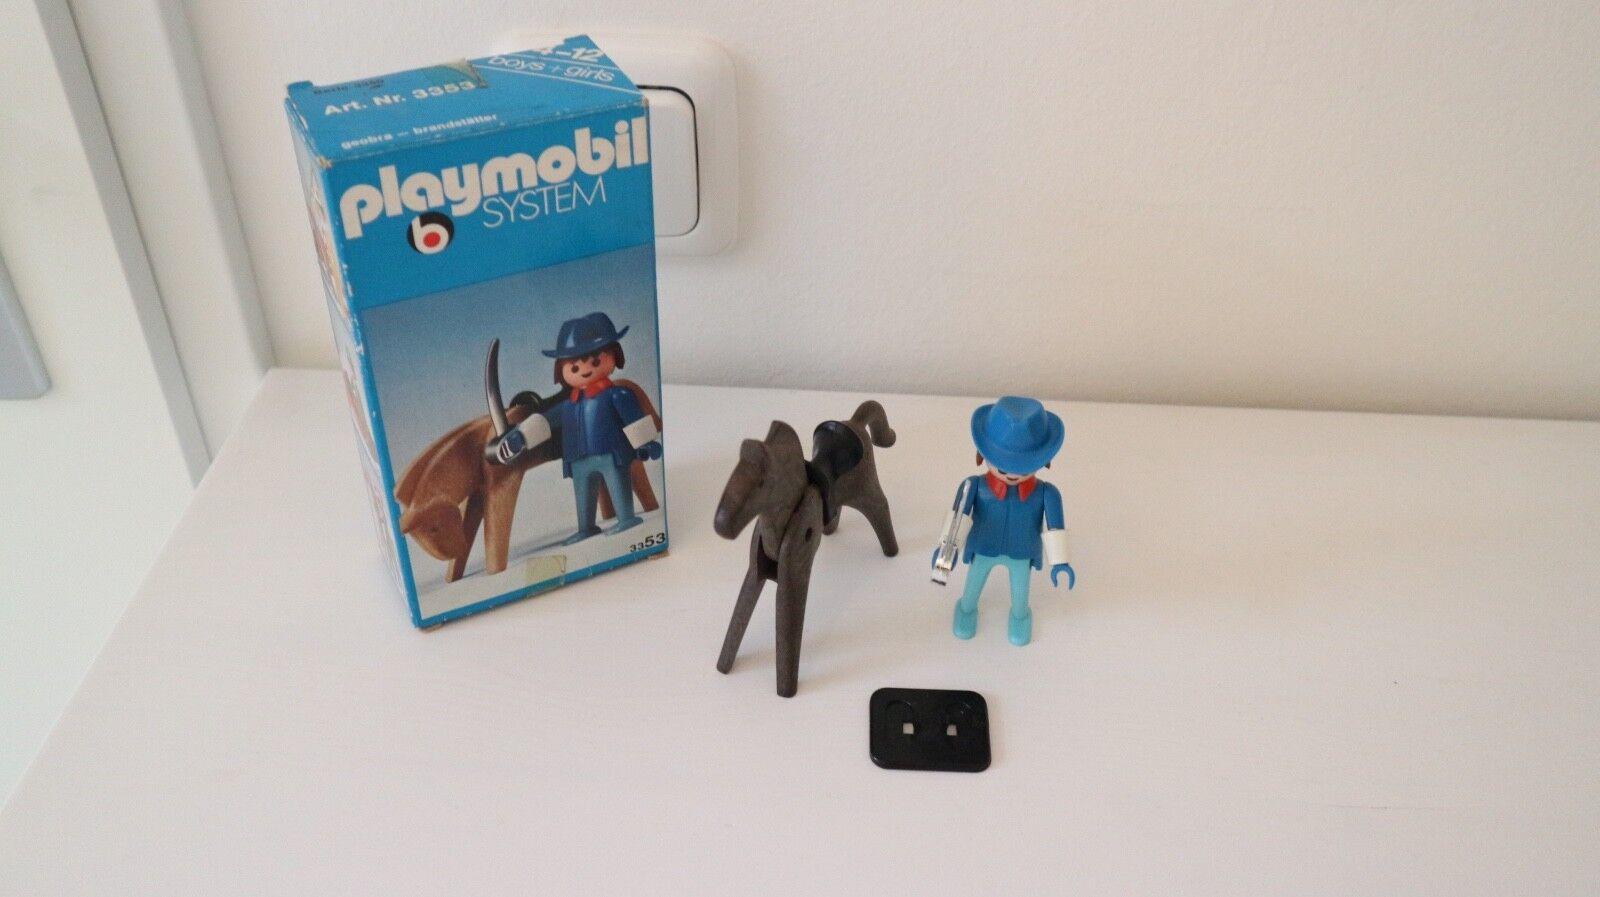 Playmobil 3353 lineart set ovp Jahr klicky western, solder, Blau army, armée